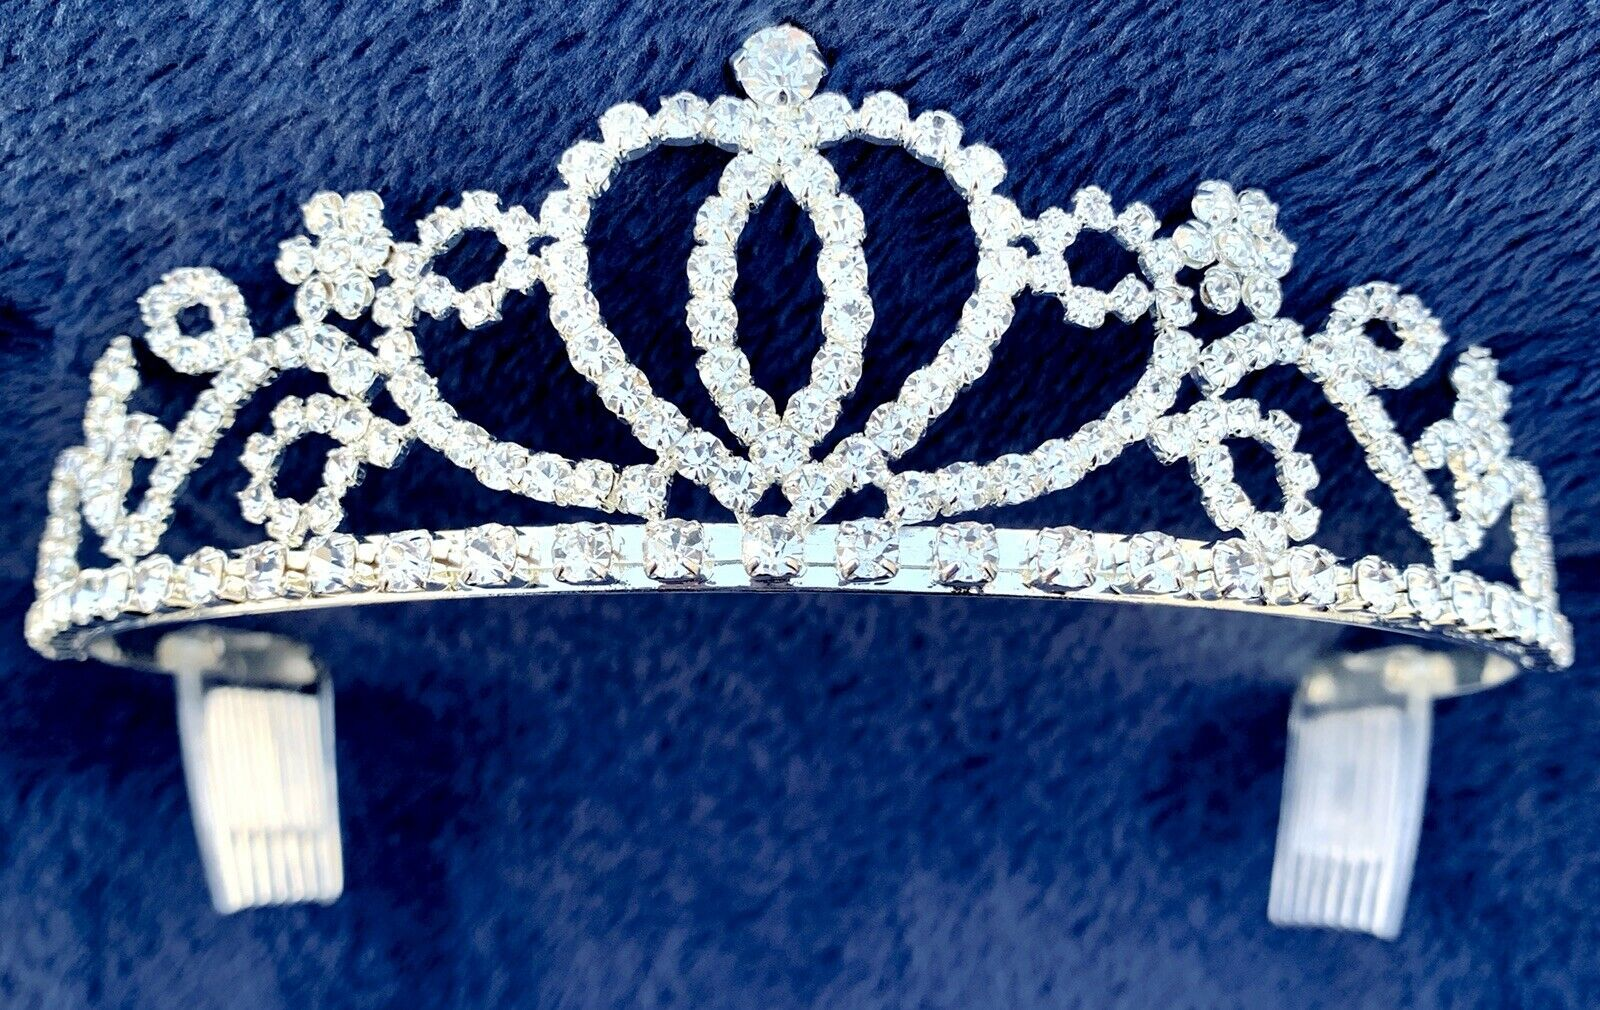 Bridal Princess Crystal Tiara Wedding Crown Hair Accessory Headband Prom Silver